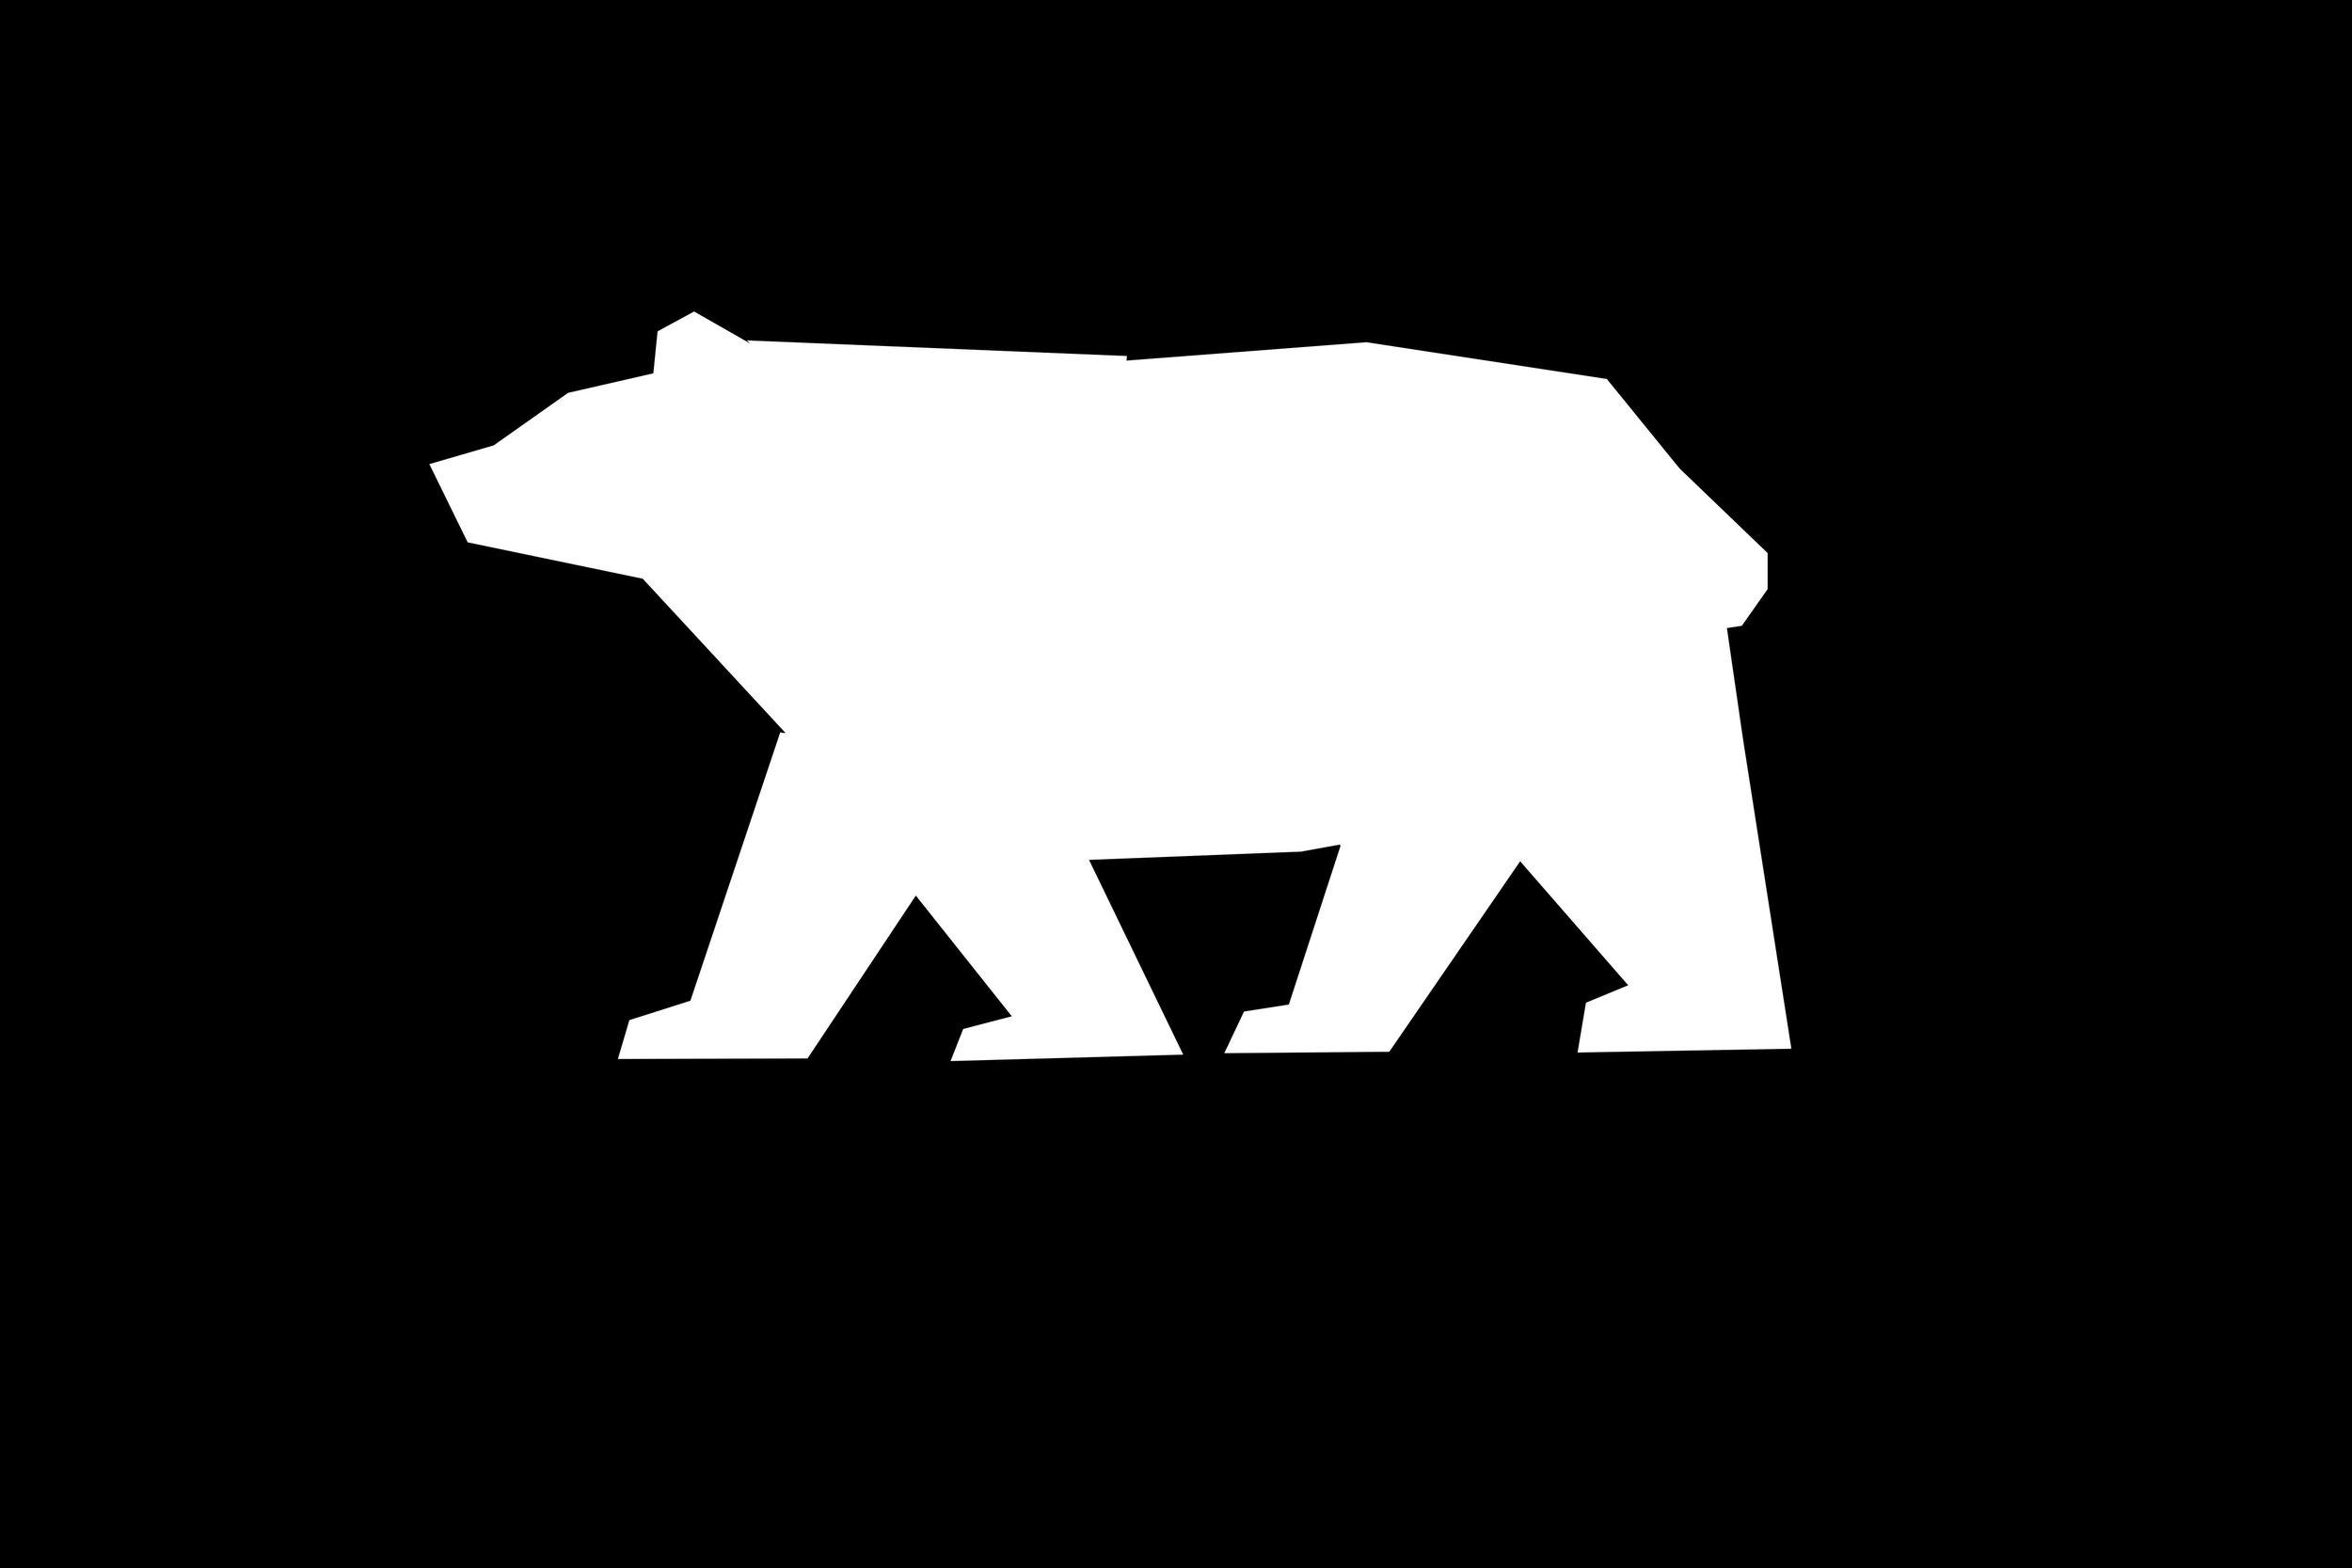 BEAR symbol.jpg